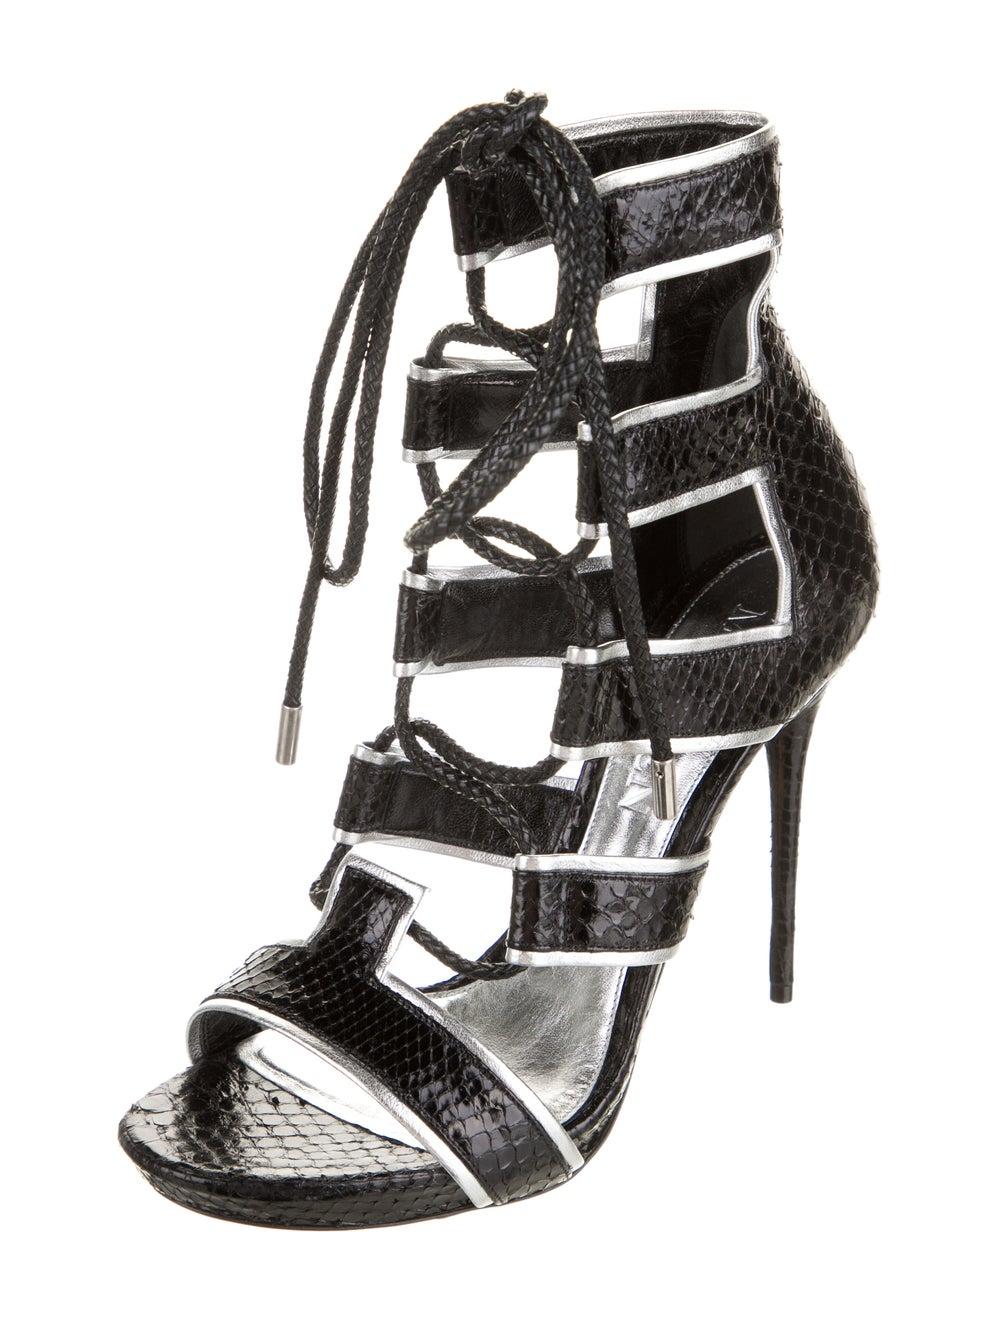 Alexander McQueen Snakeskin Platform Sandals Black - image 2